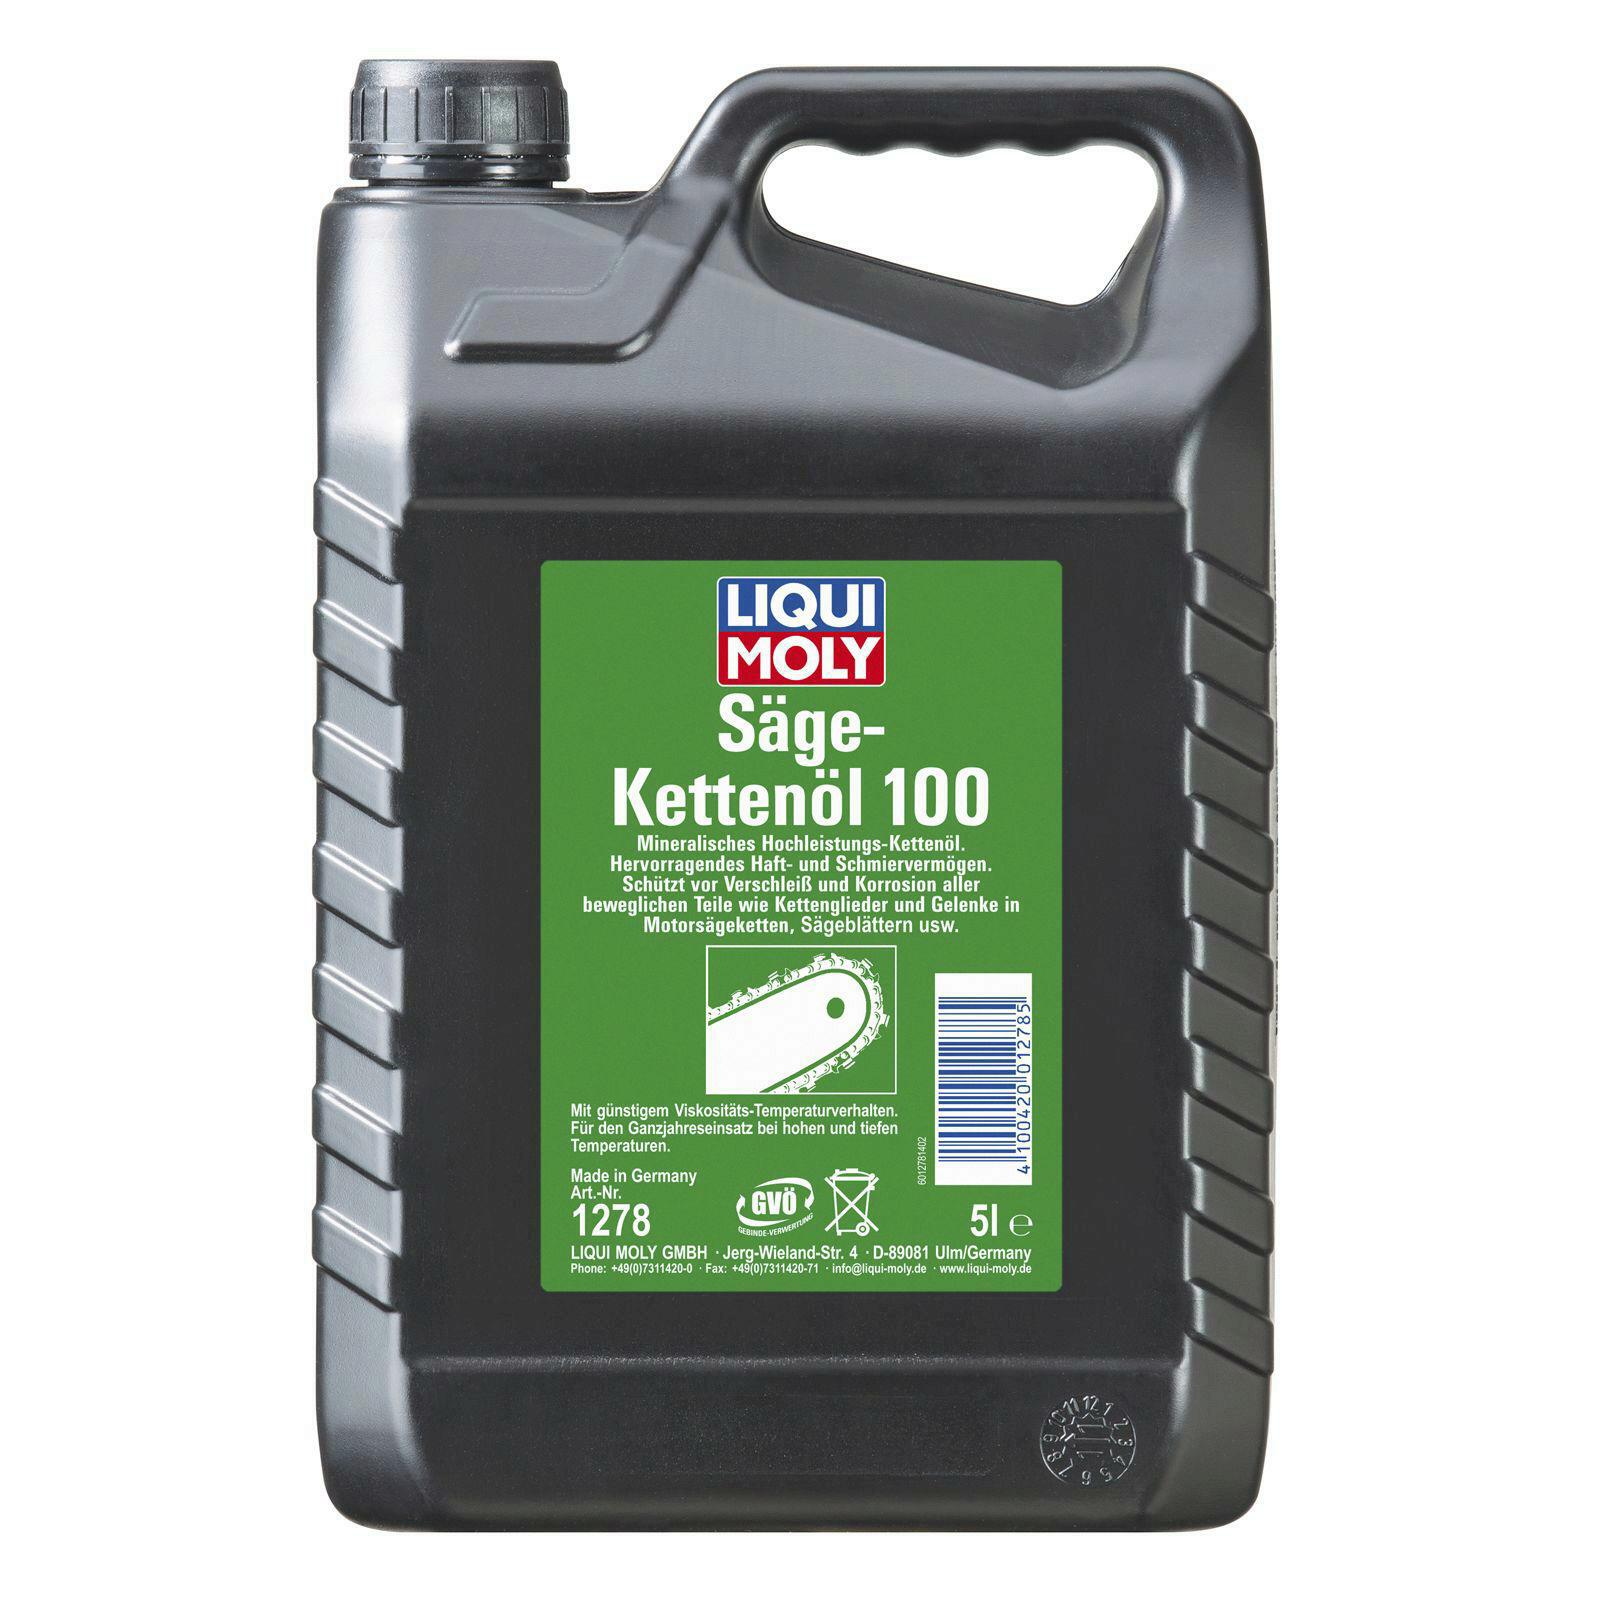 Liqui Moly Säge-Kettenöl 100 5l